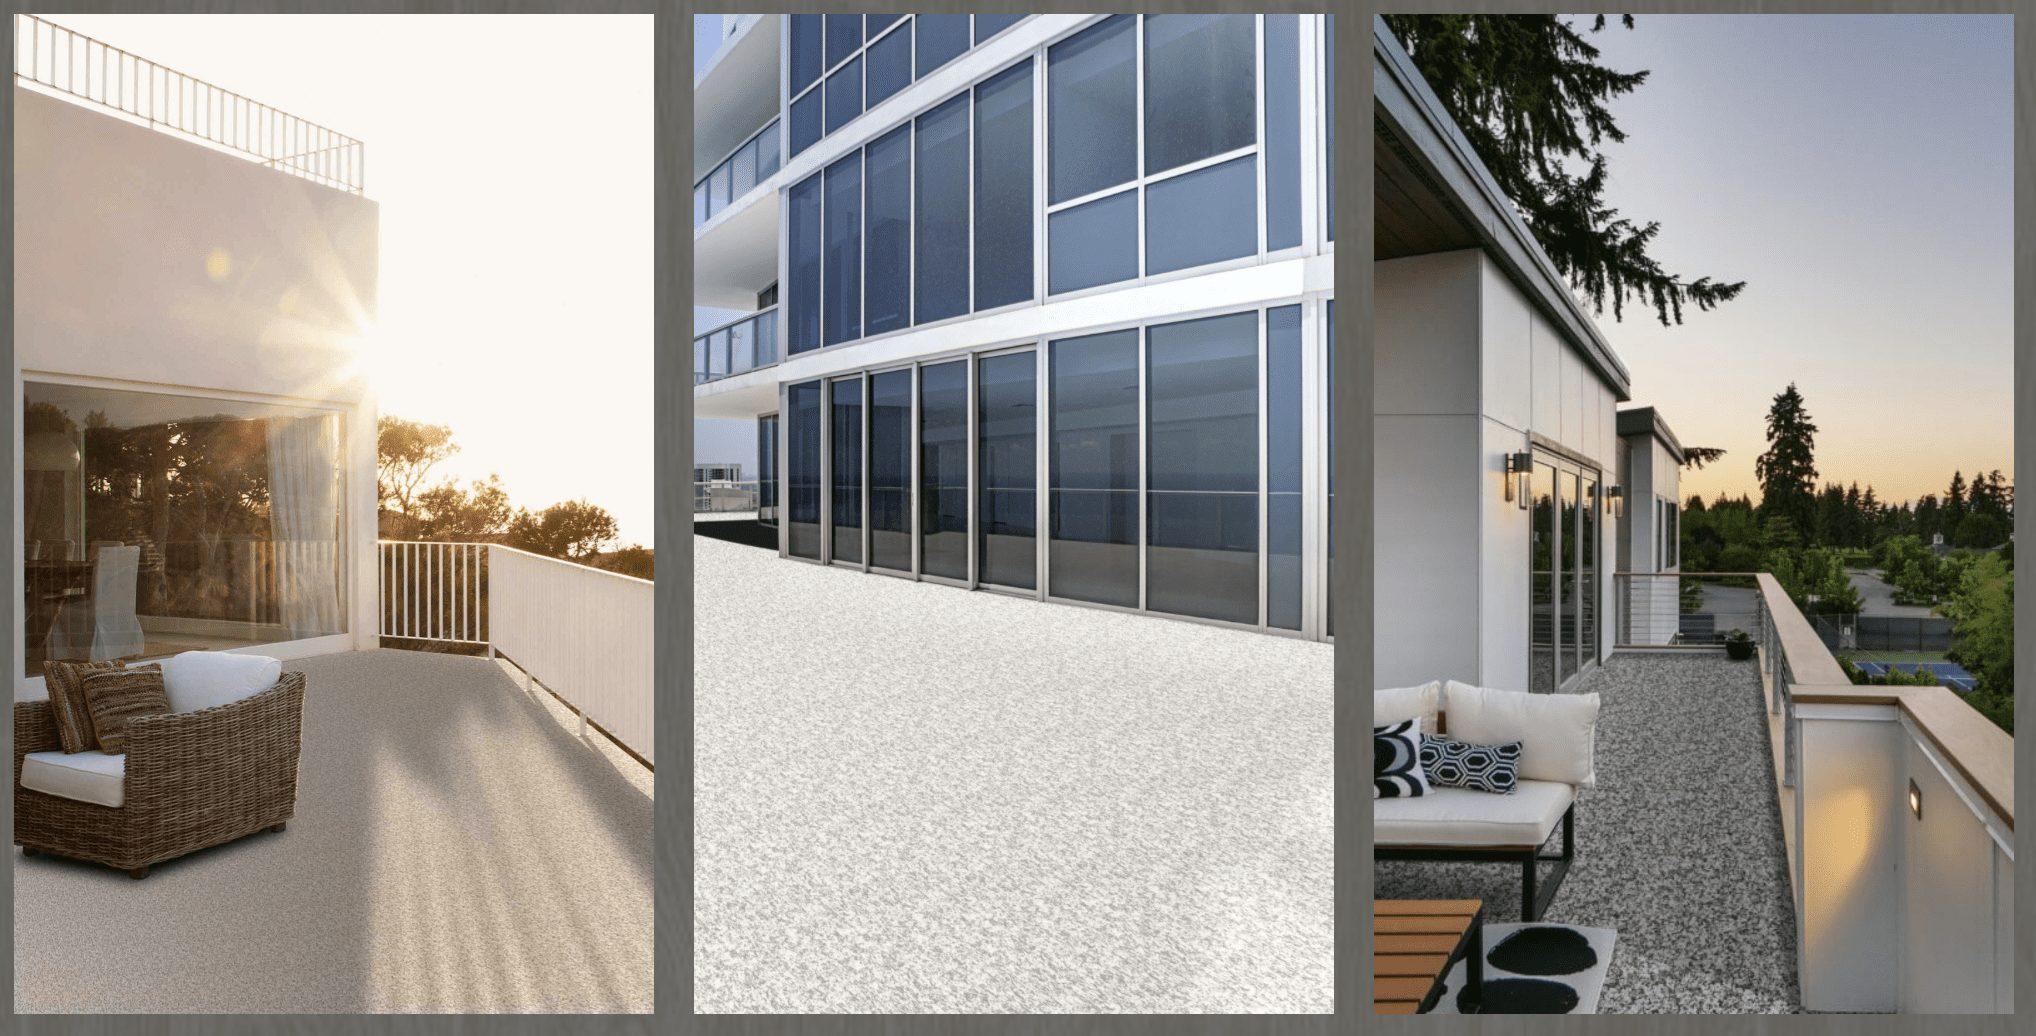 Thermoplastic Membrane Deck Waterproofing